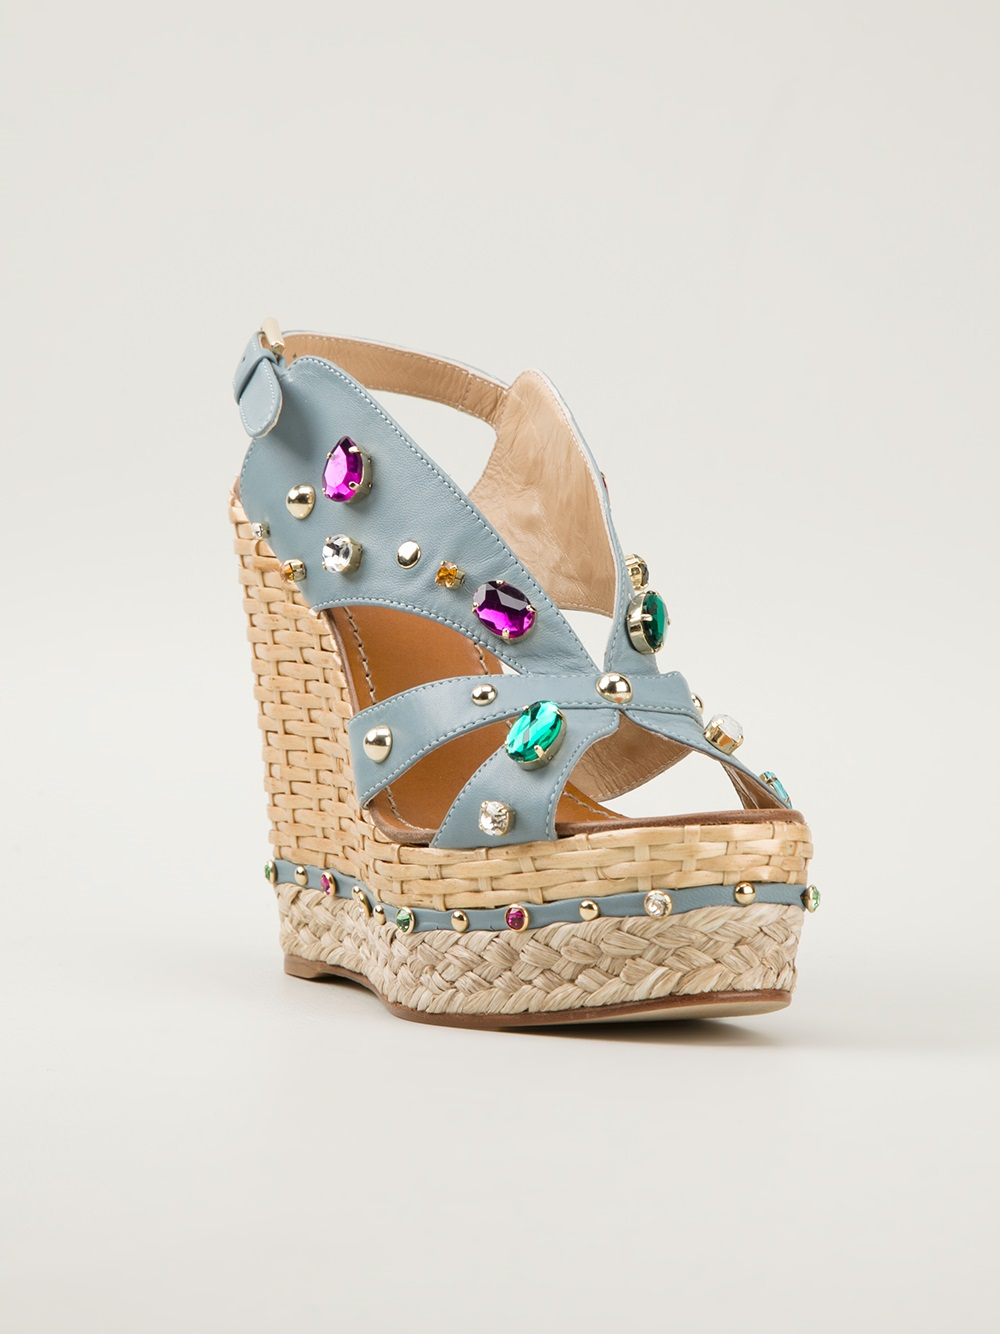 Dolce Amp Gabbana Embellished Wedge Sandals In Blue Brown